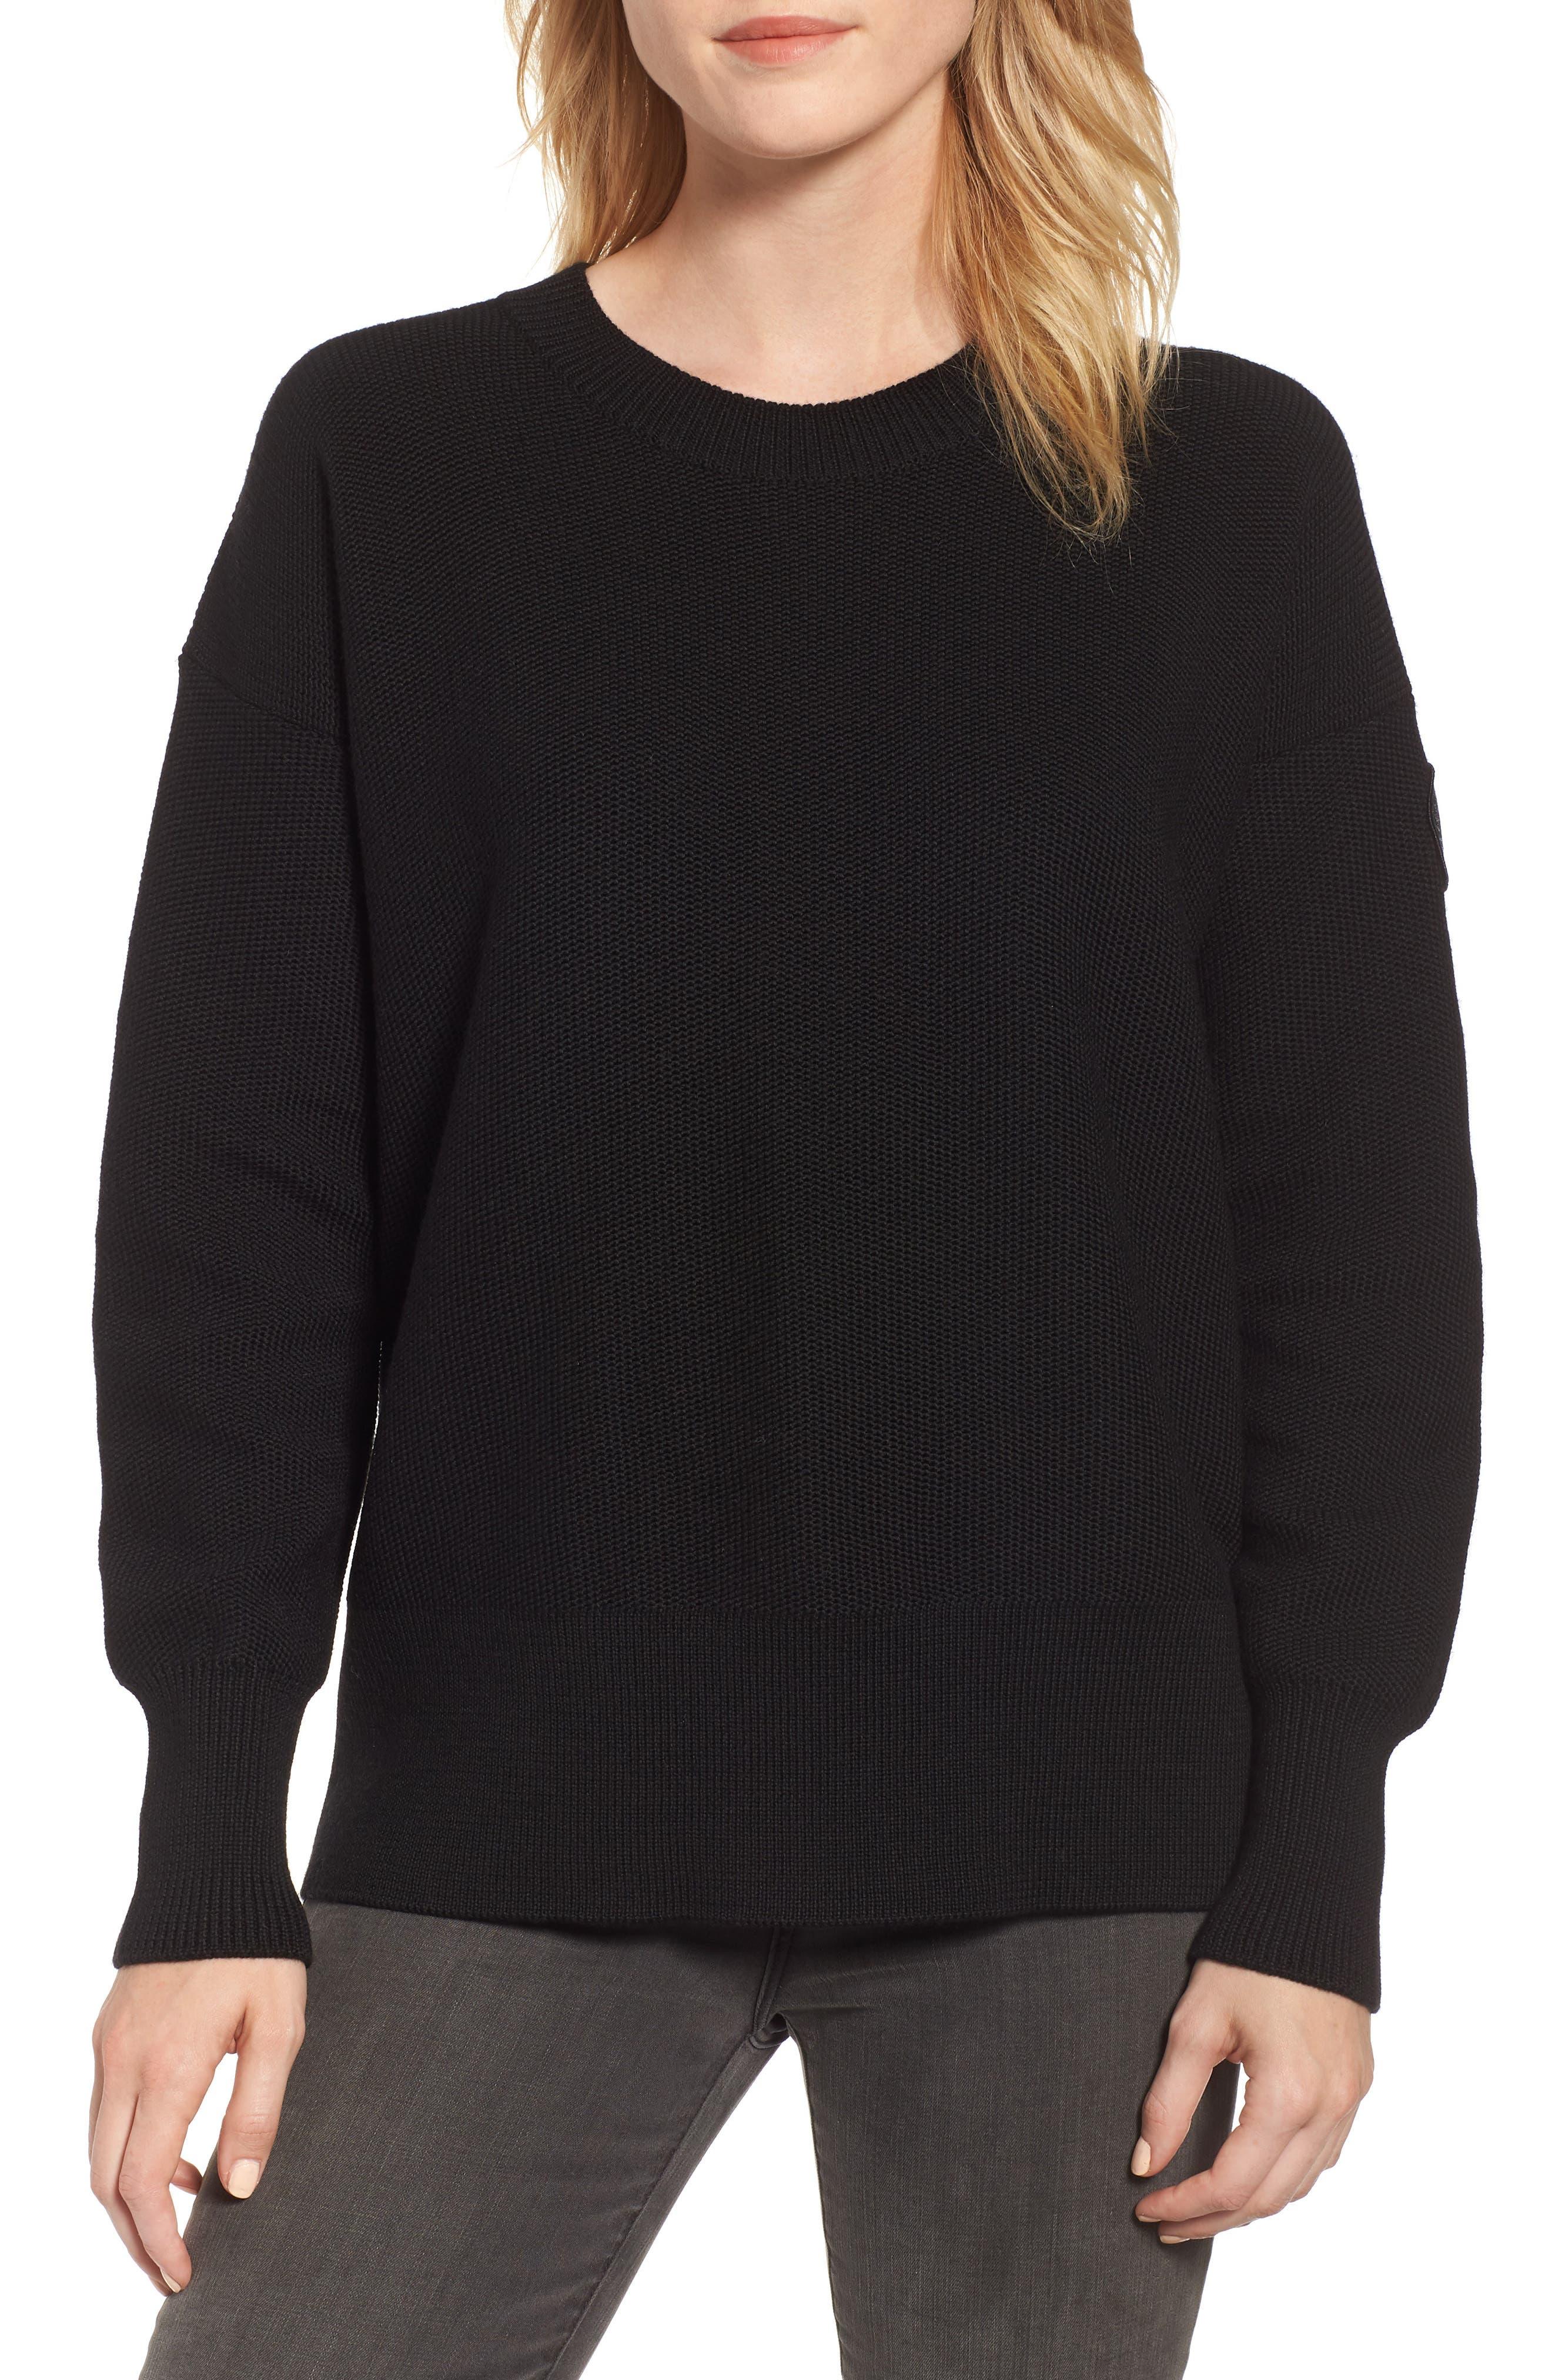 Canada Goose Aleza Merino Wool Sweater, (0) - Black